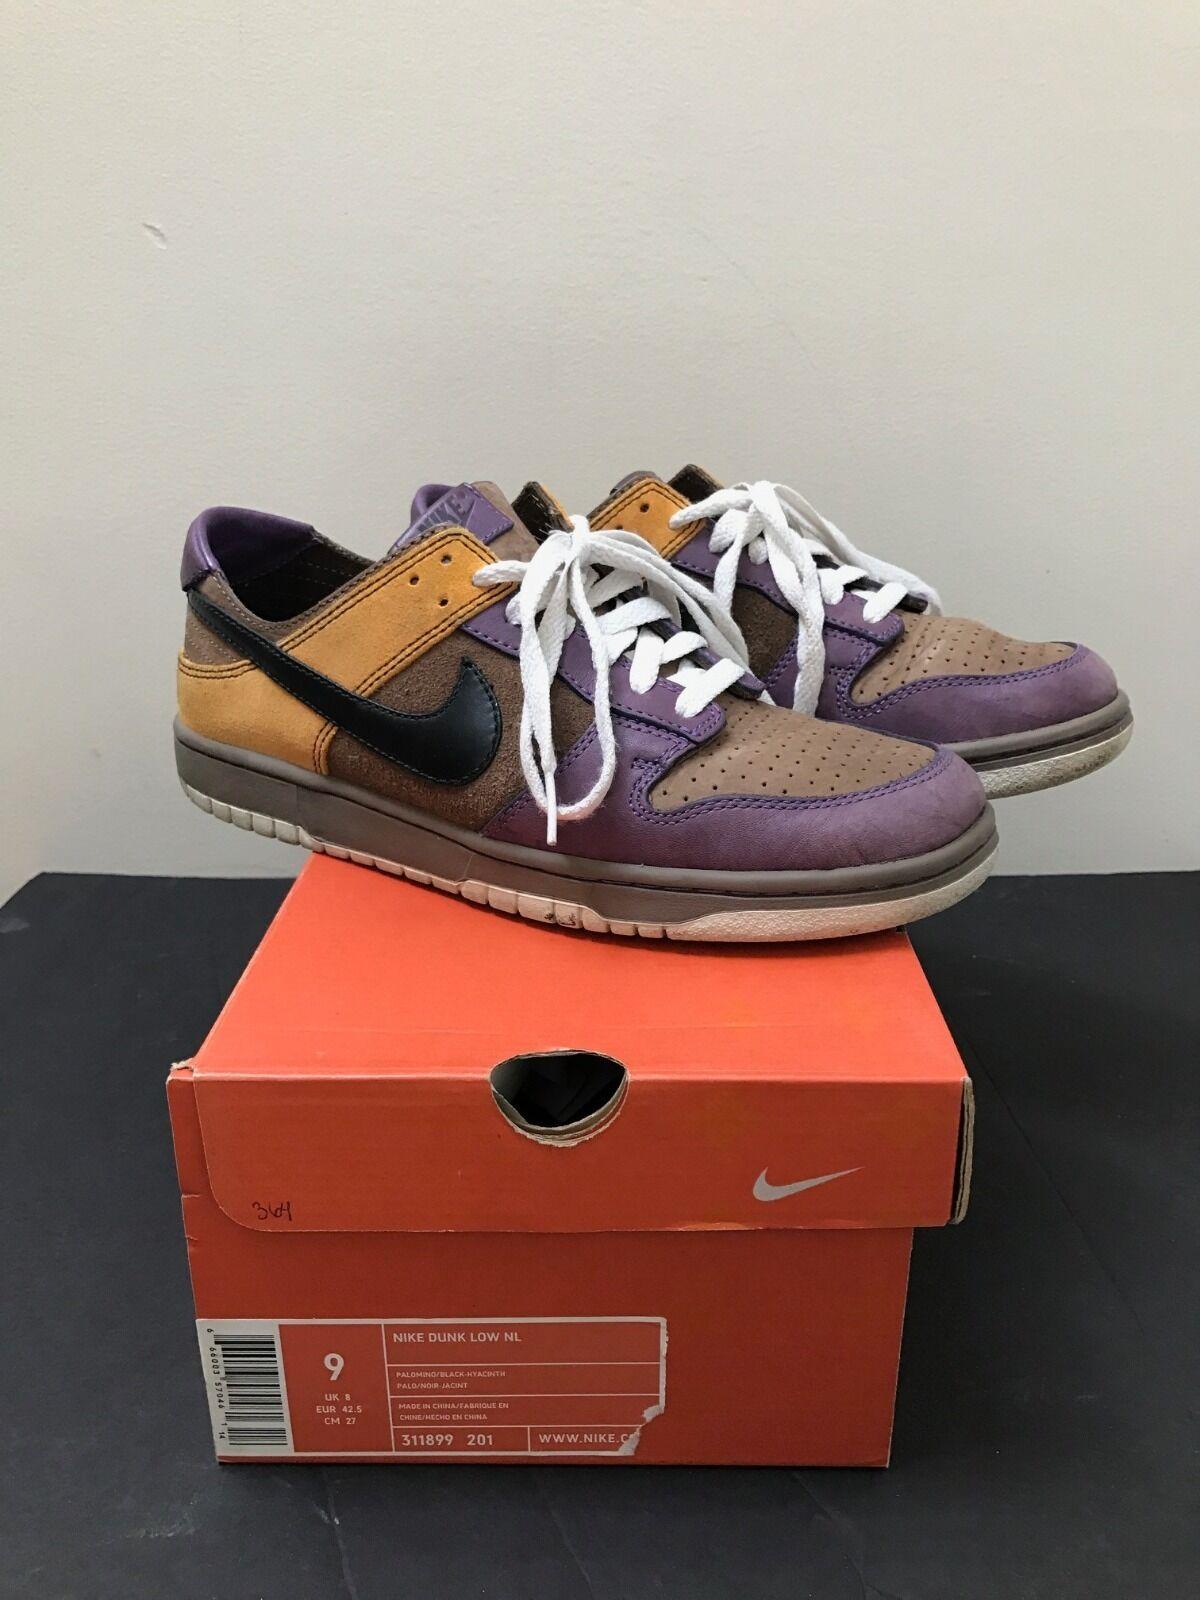 Nike Dunk Low NL Palomino Black-Hyacinth shoes Size 9 (311899 201)